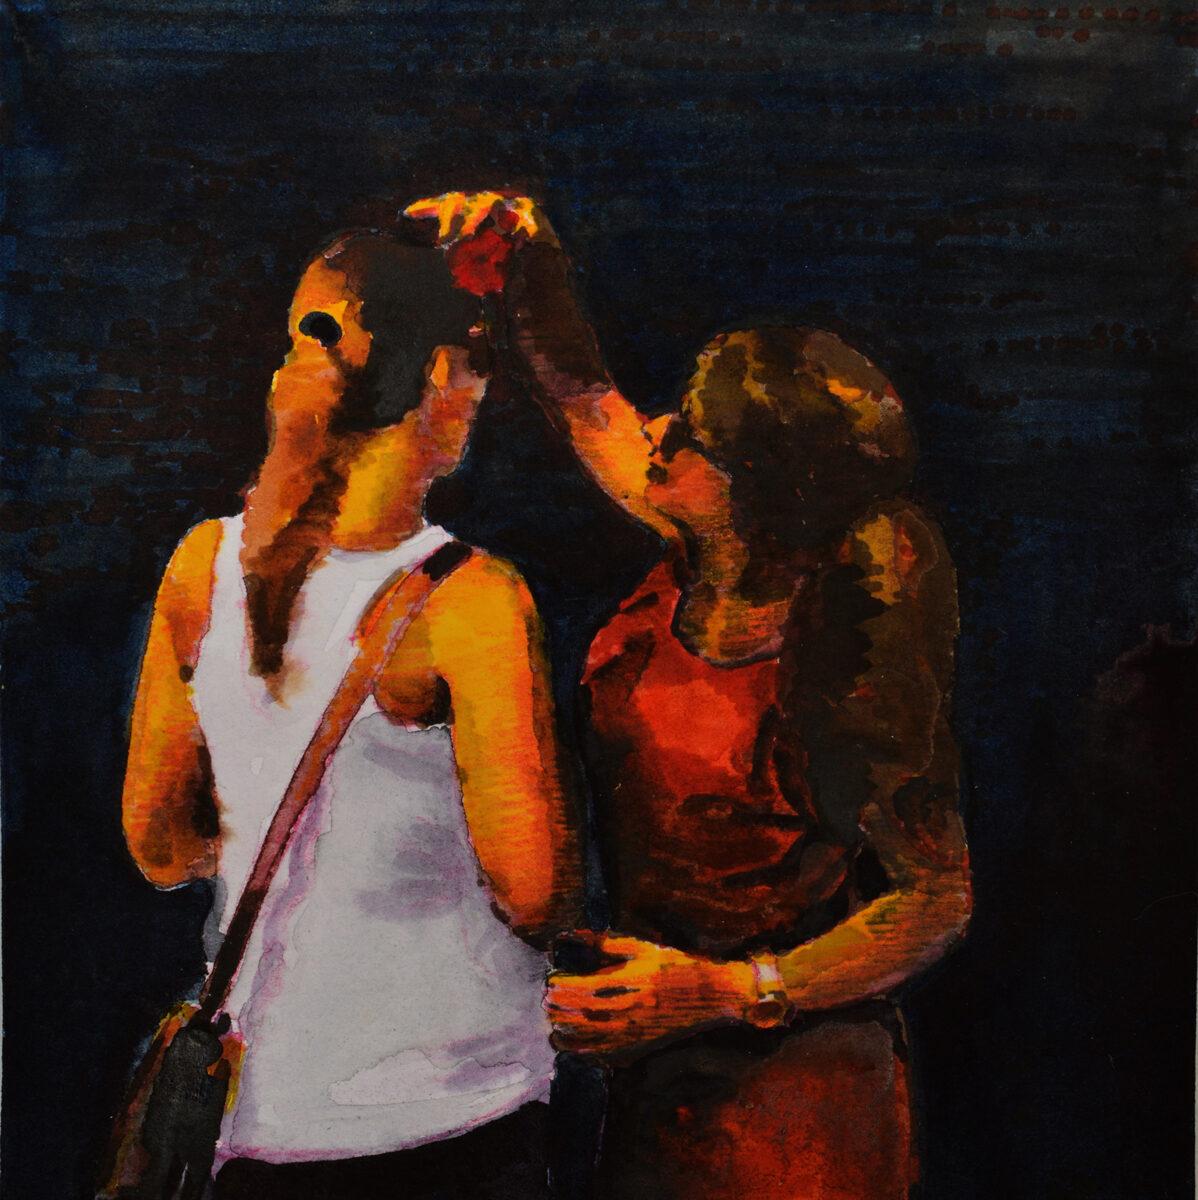 Una rosa pa tu pelo. Juanma Moreno Sánchez 2015. Arte contemporáneo